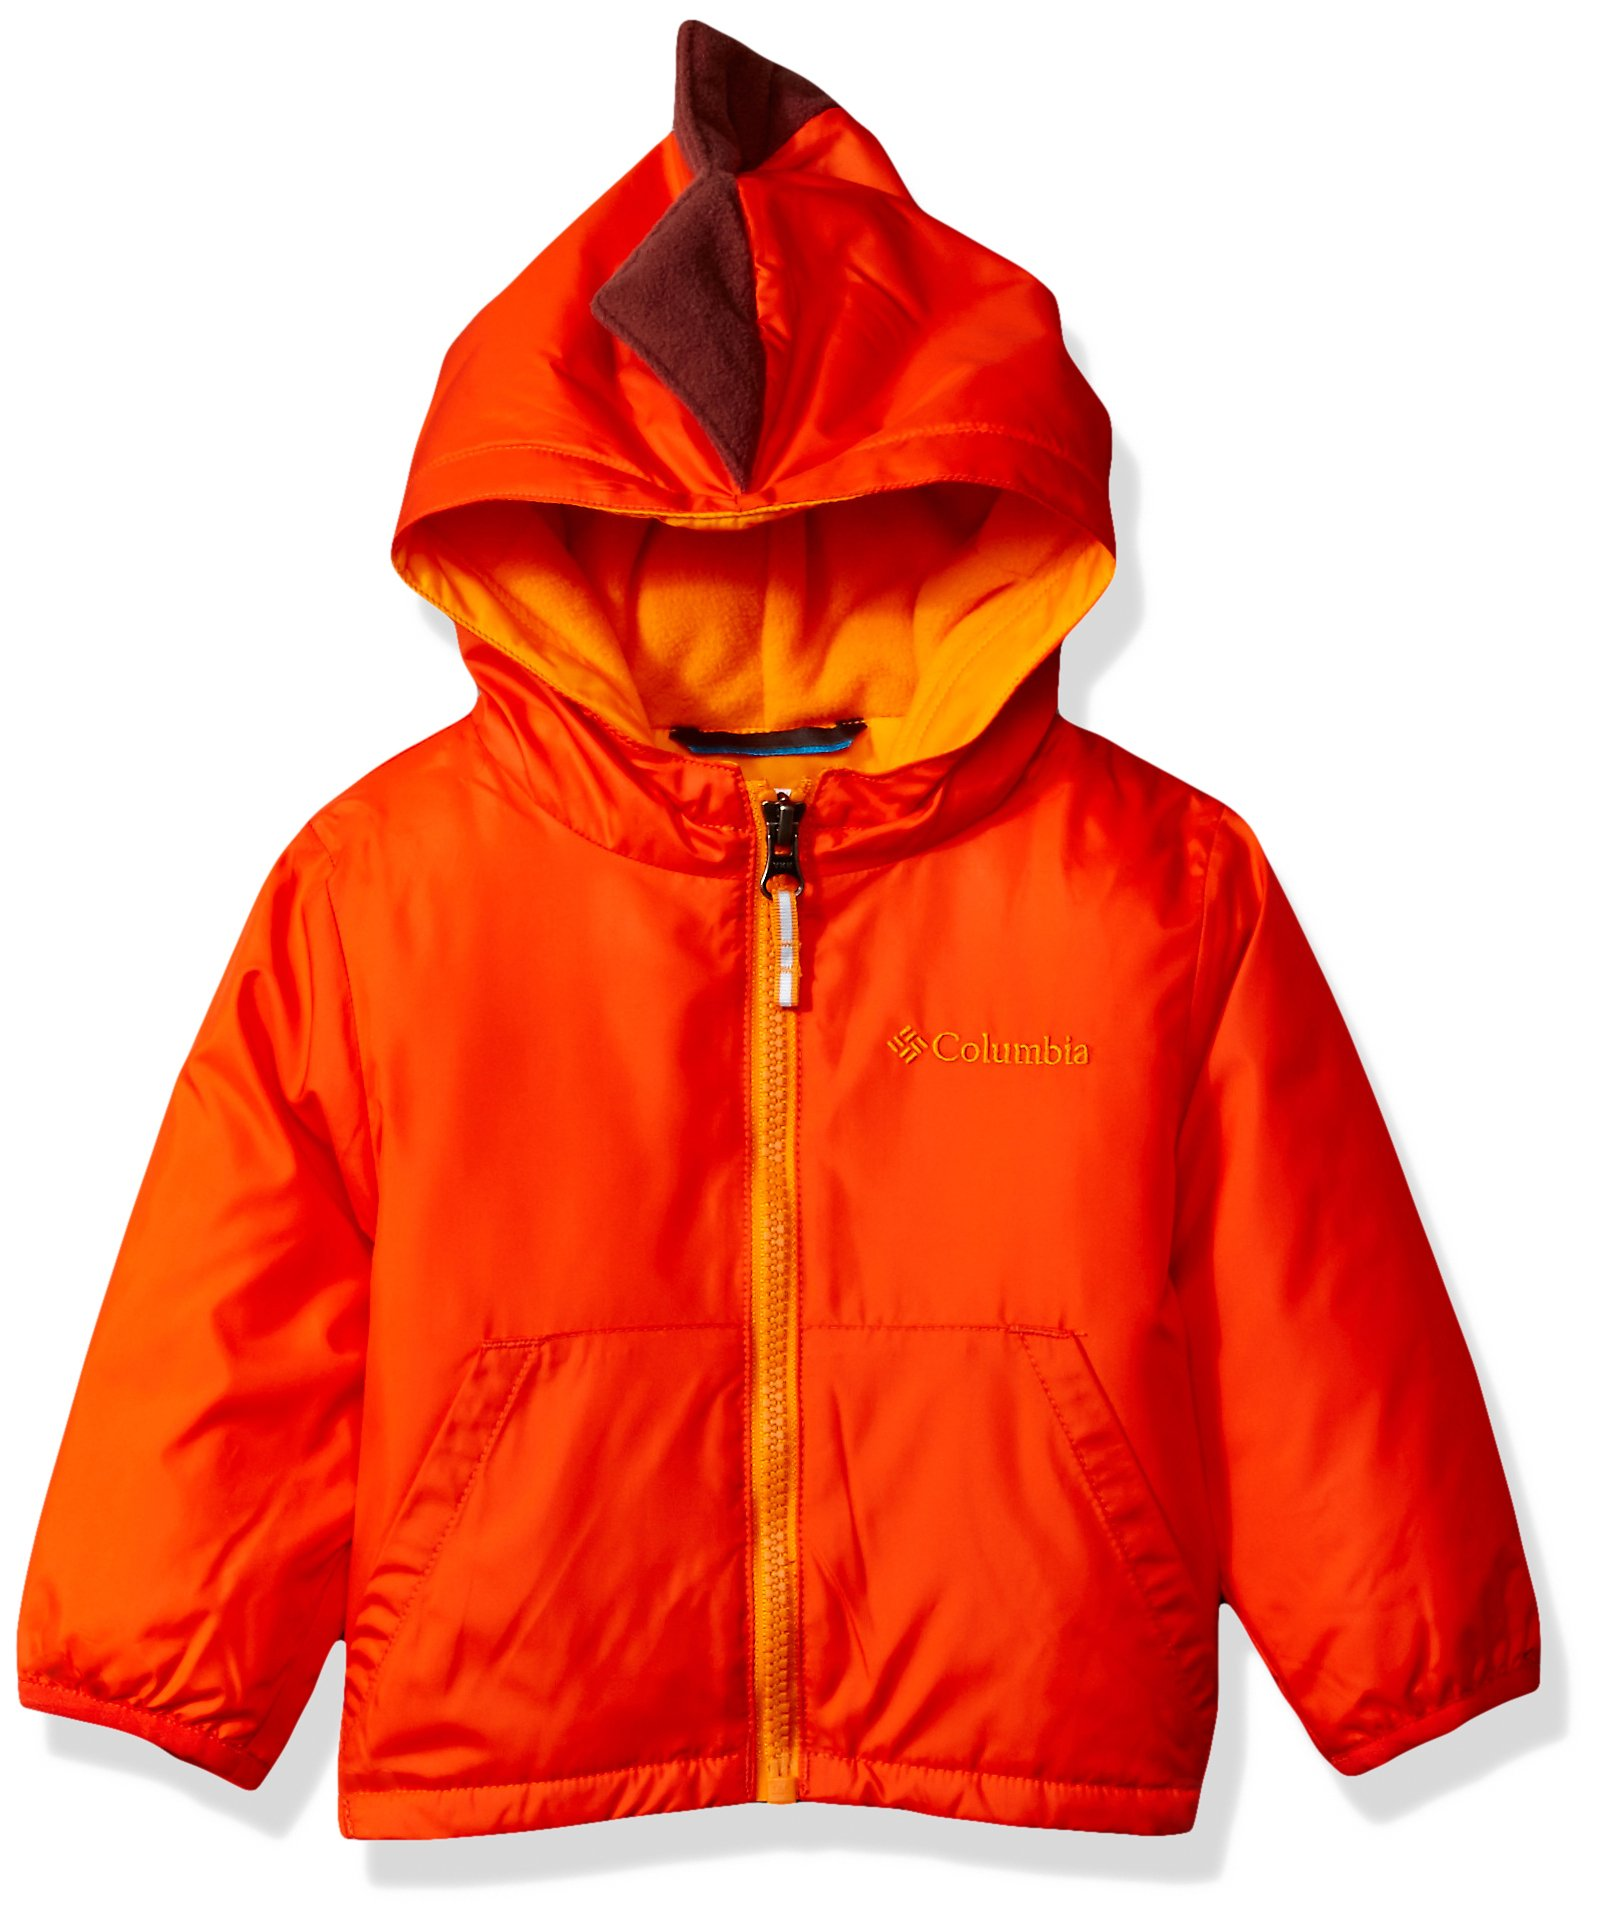 Columbia Baby Boys' Kitterwibbit Jacket, State Orange, 12-18 Months by Columbia